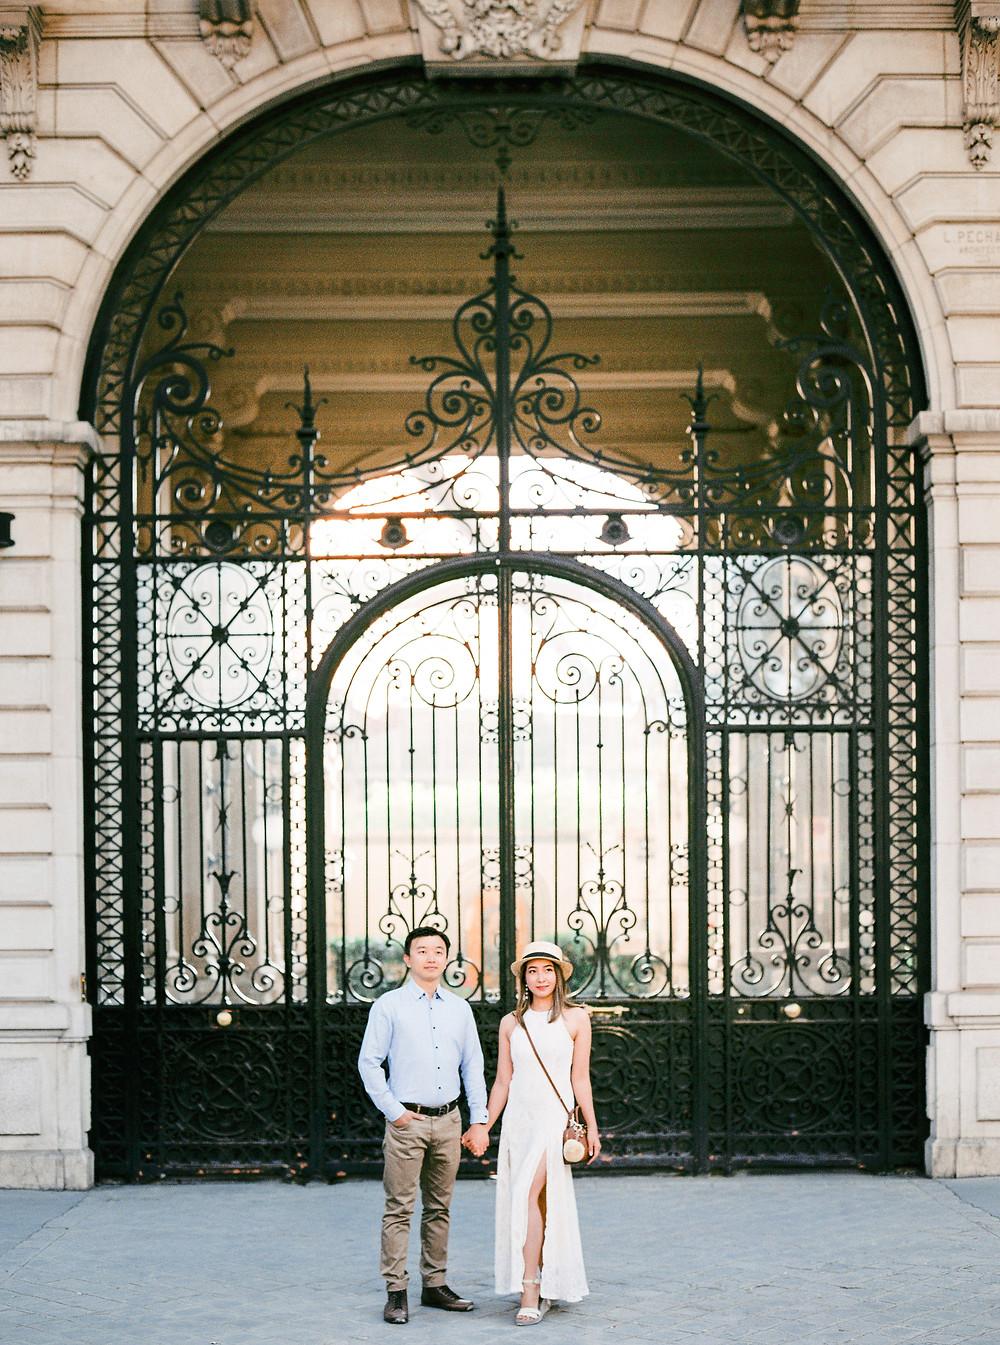 Paris love story photoshoot